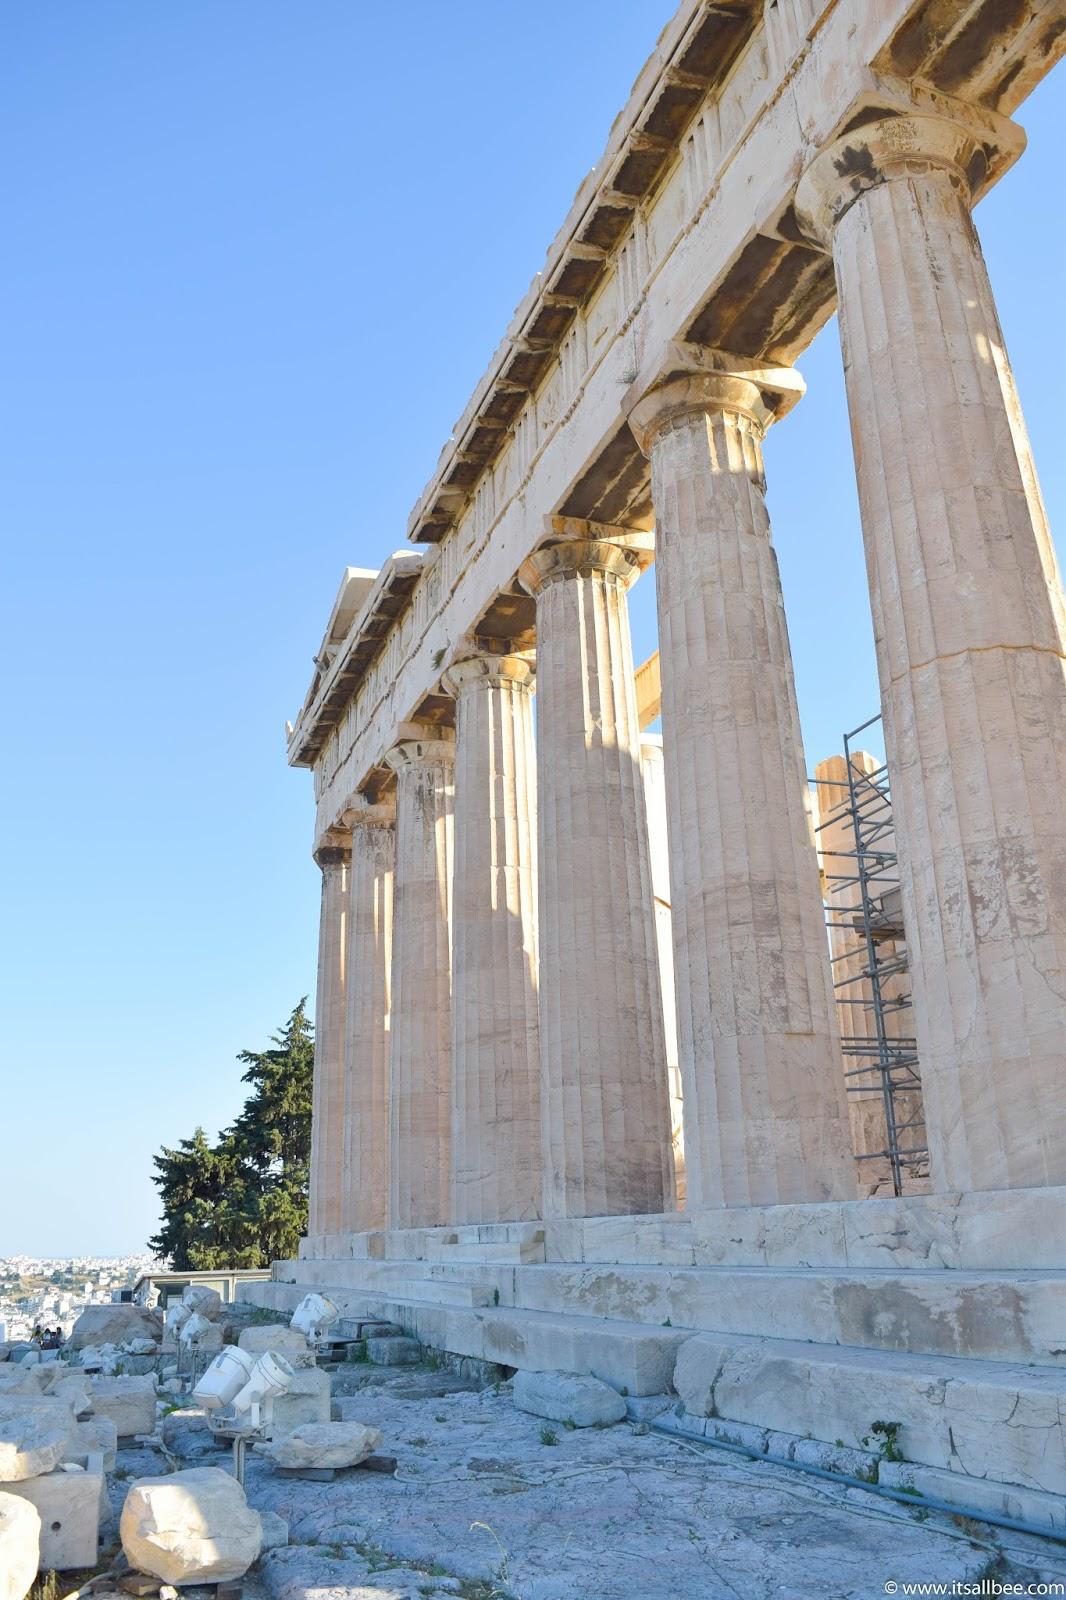 The Acropolis (The High City